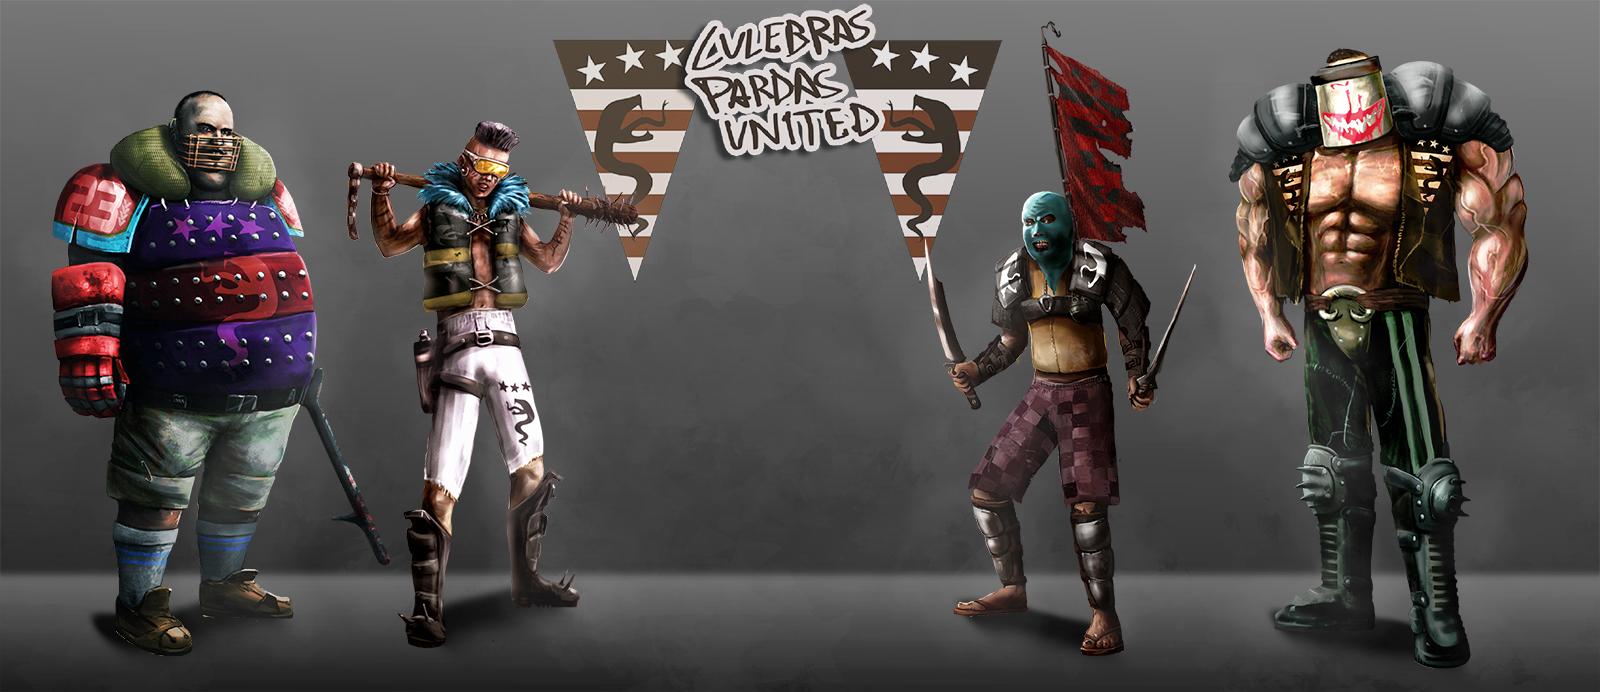 Culebras Pardas United by Ryoishen